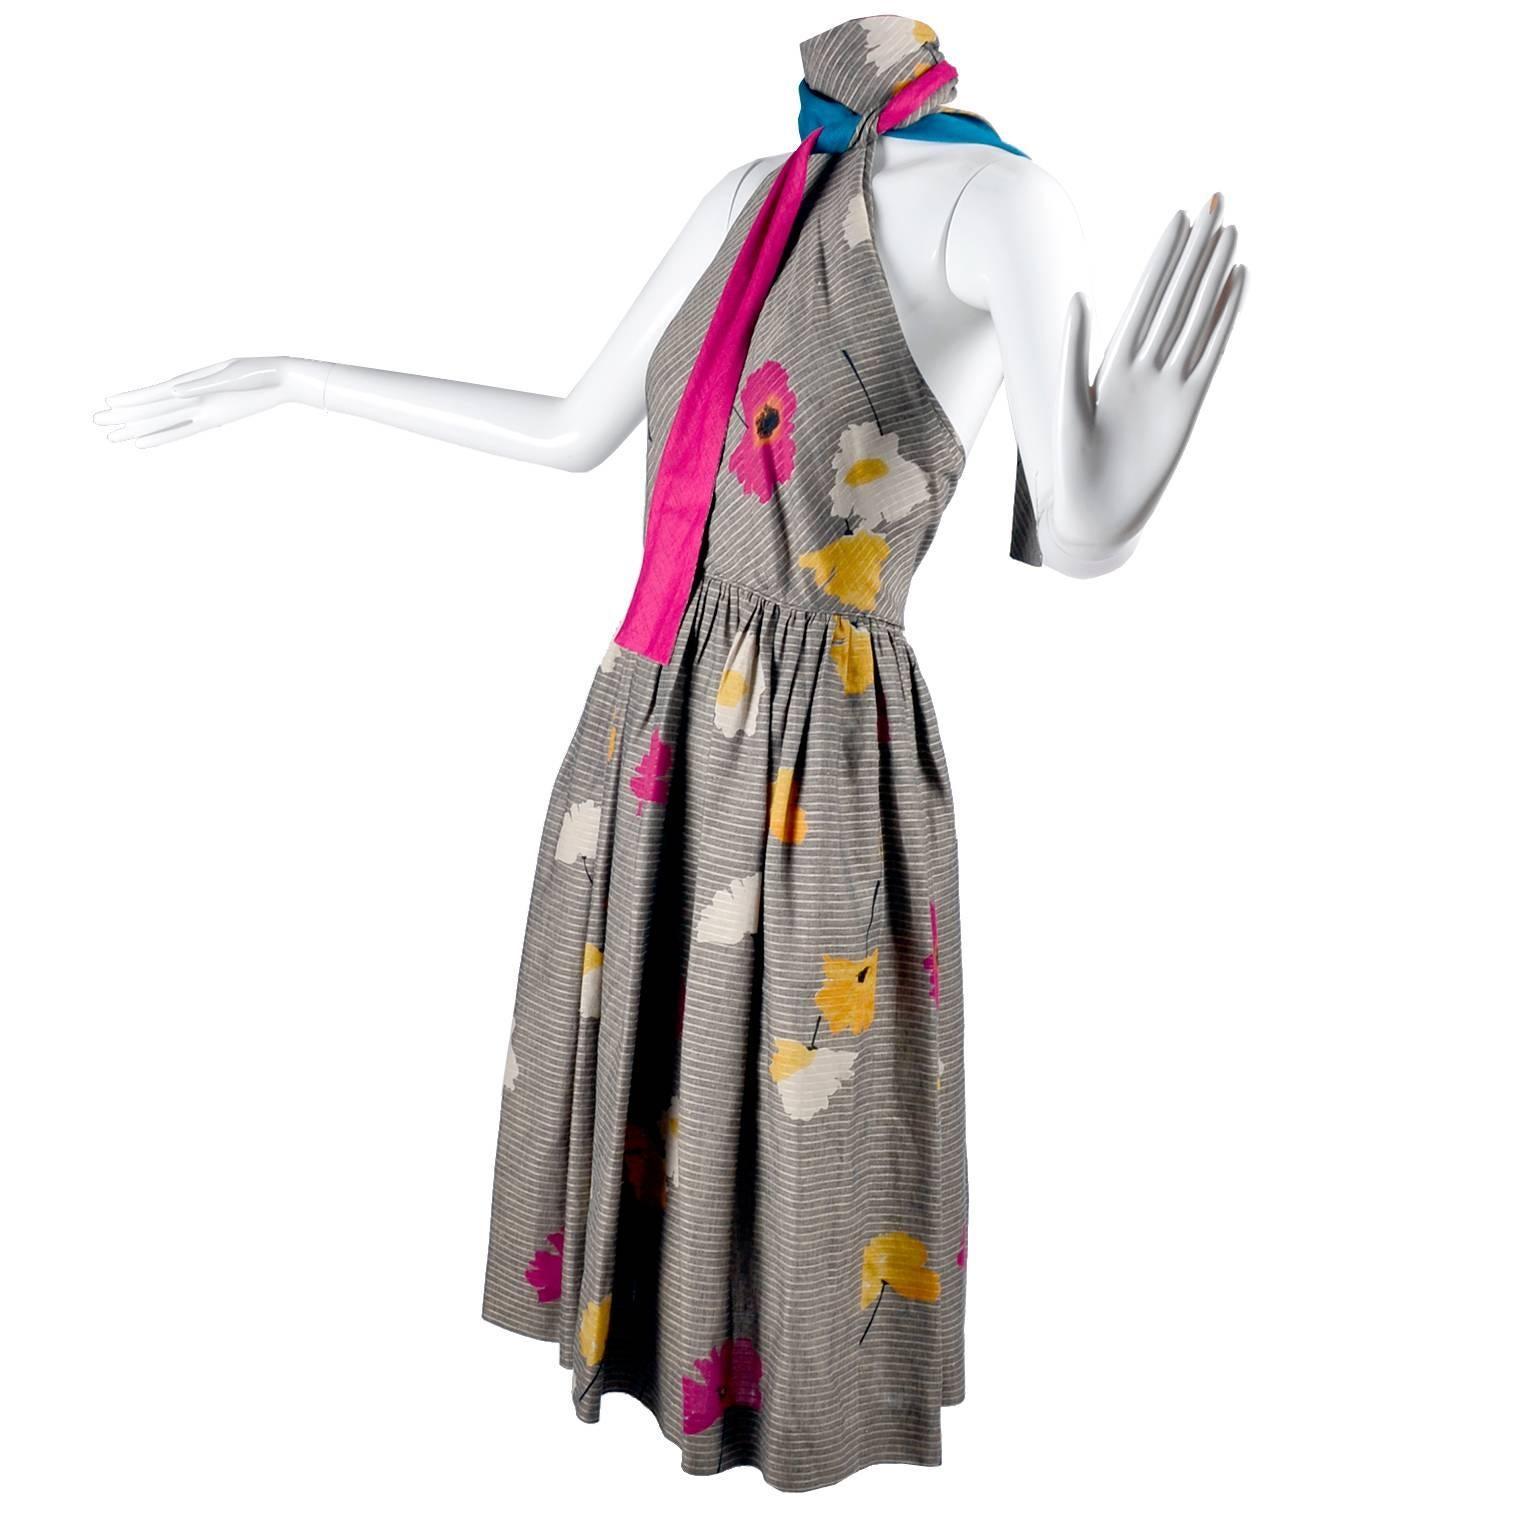 Vintage 1970s Albert Nipon Halter Dress in Linen and Cotton Floral Print Size 2